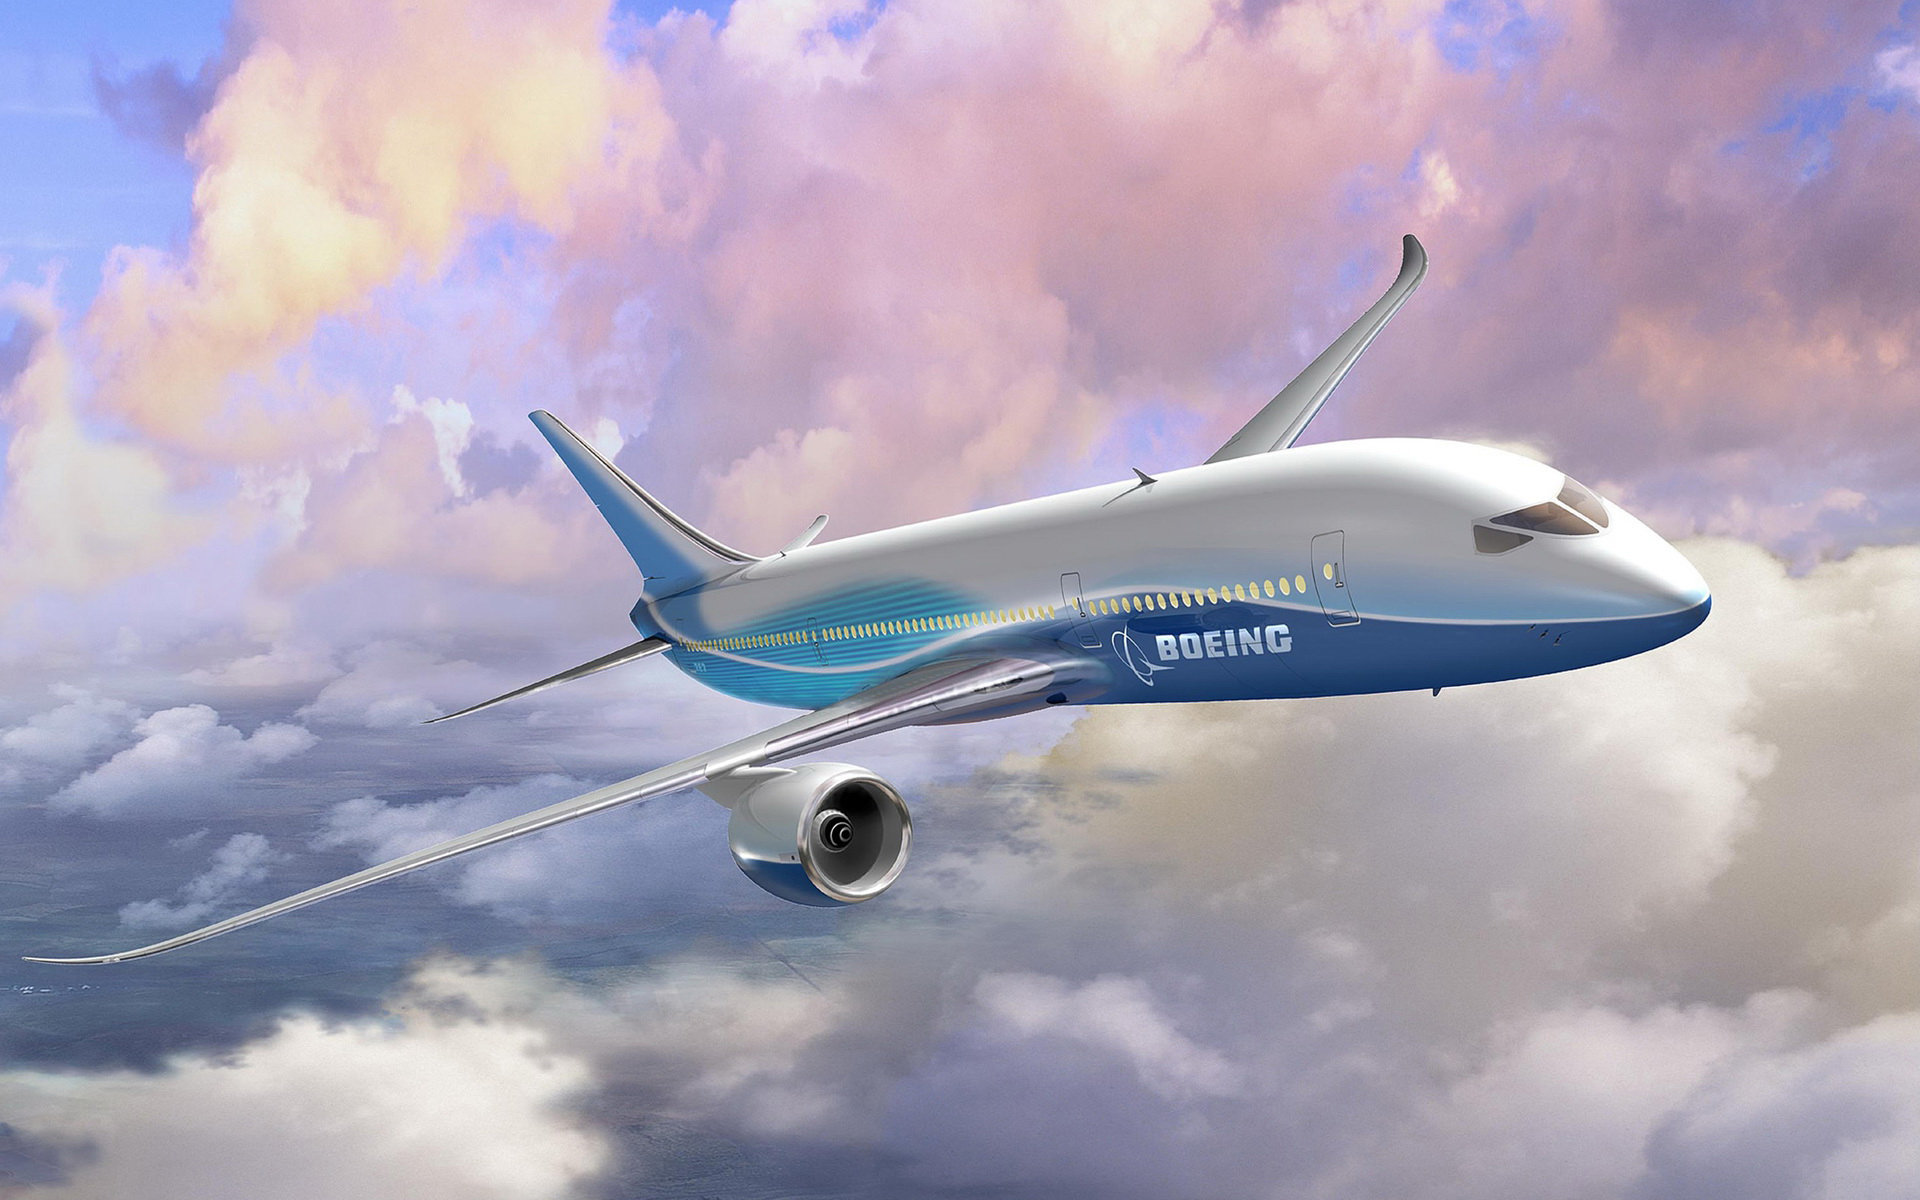 High Resolution Airplane Aircraft Hd 1920x1200 Wallpaper